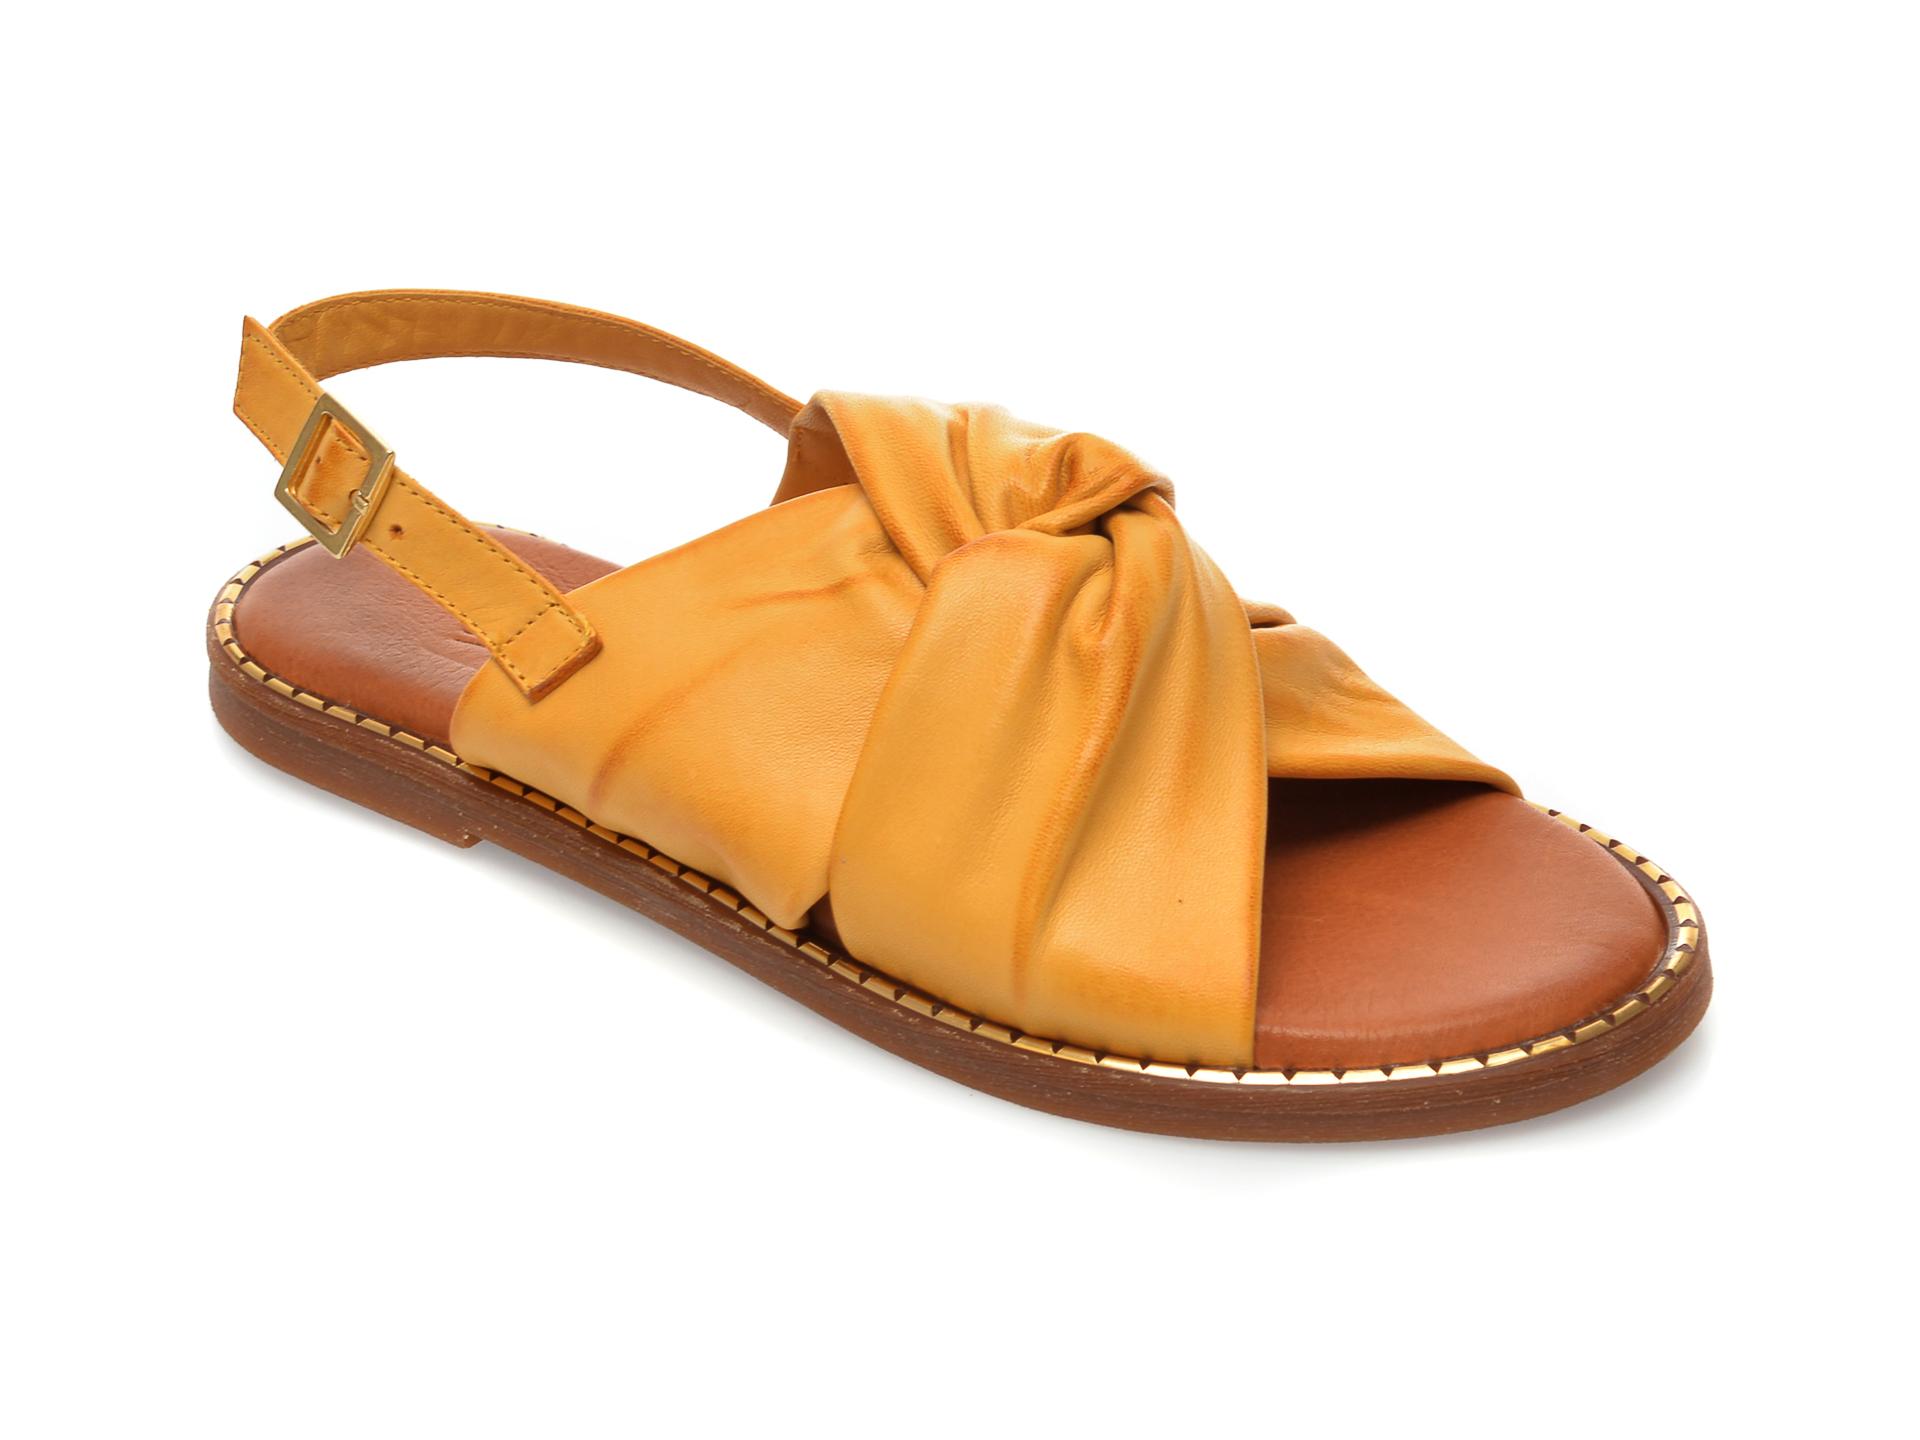 Sandale IMAGE galbene, 719, din piele naturala imagine otter.ro 2021